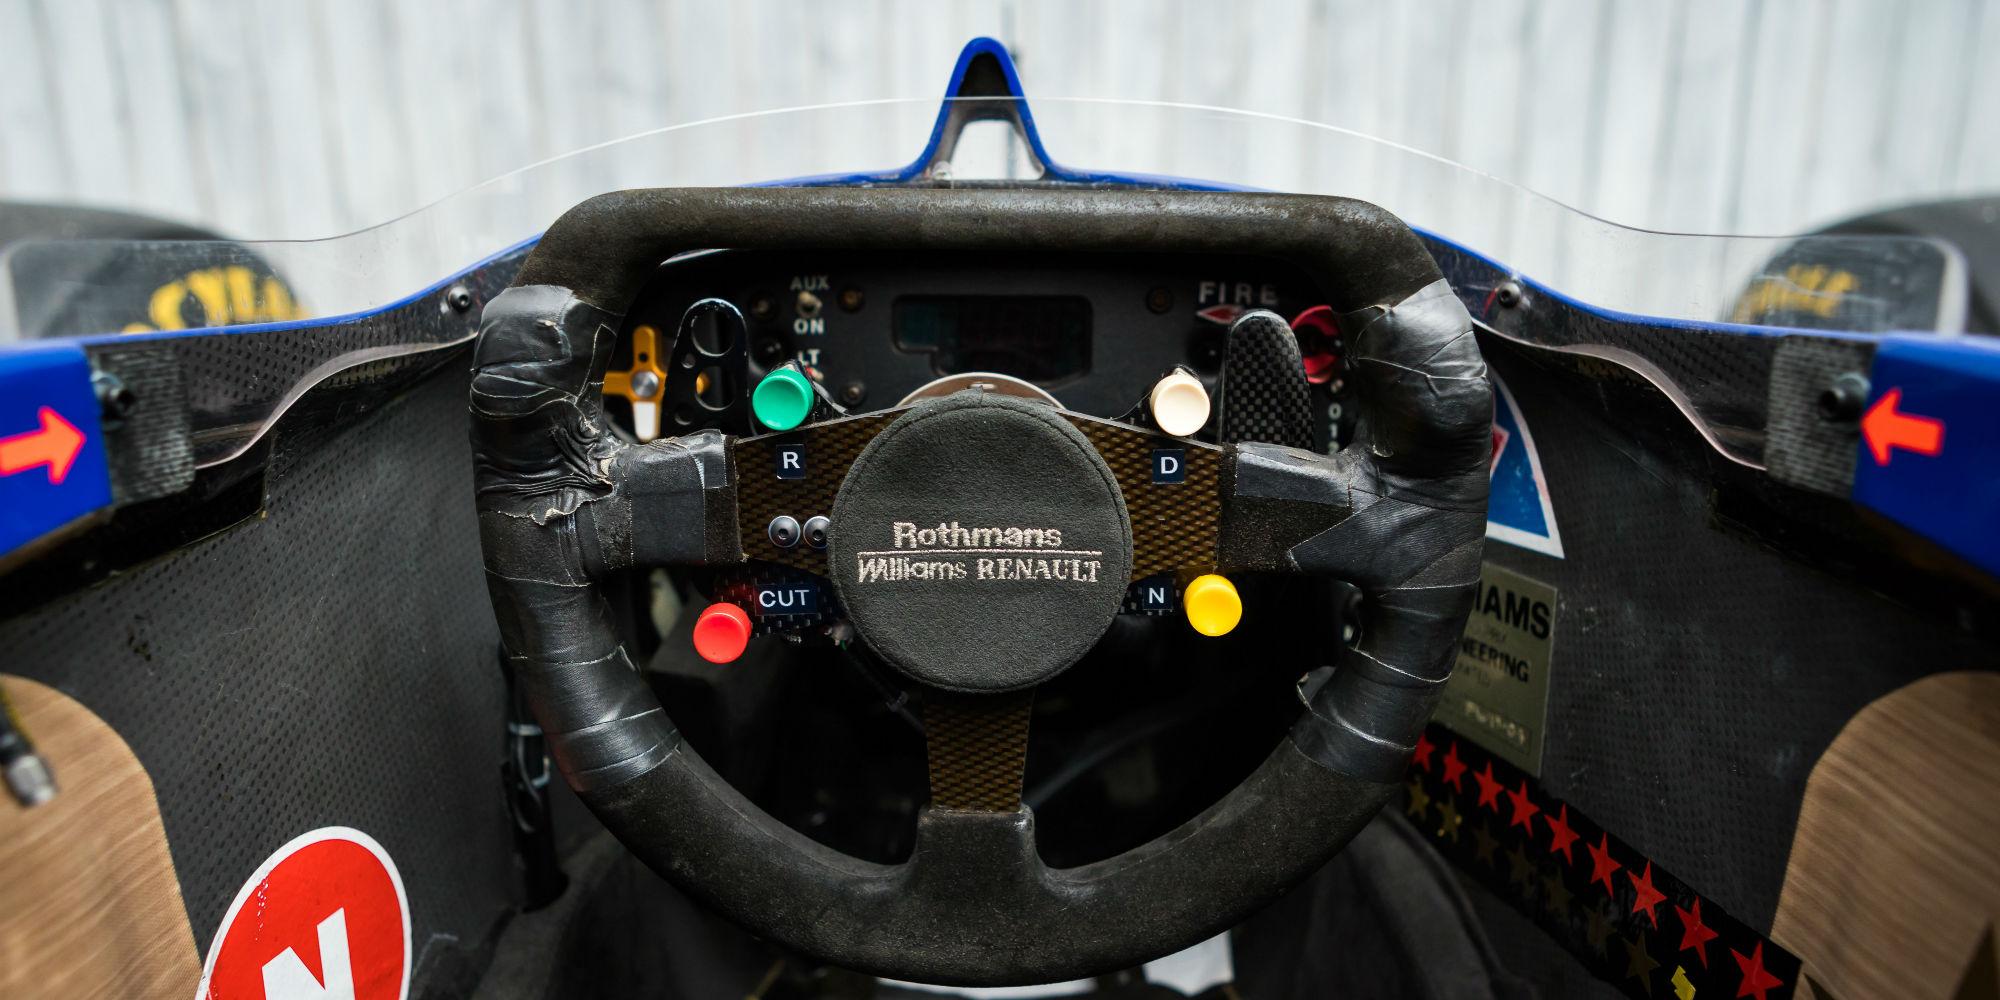 The Ex – Heinz-Harald Frentzen, San Marino Grand Prix Winning, 2nd in the Drivers' World Championship 1997 Williams FW19